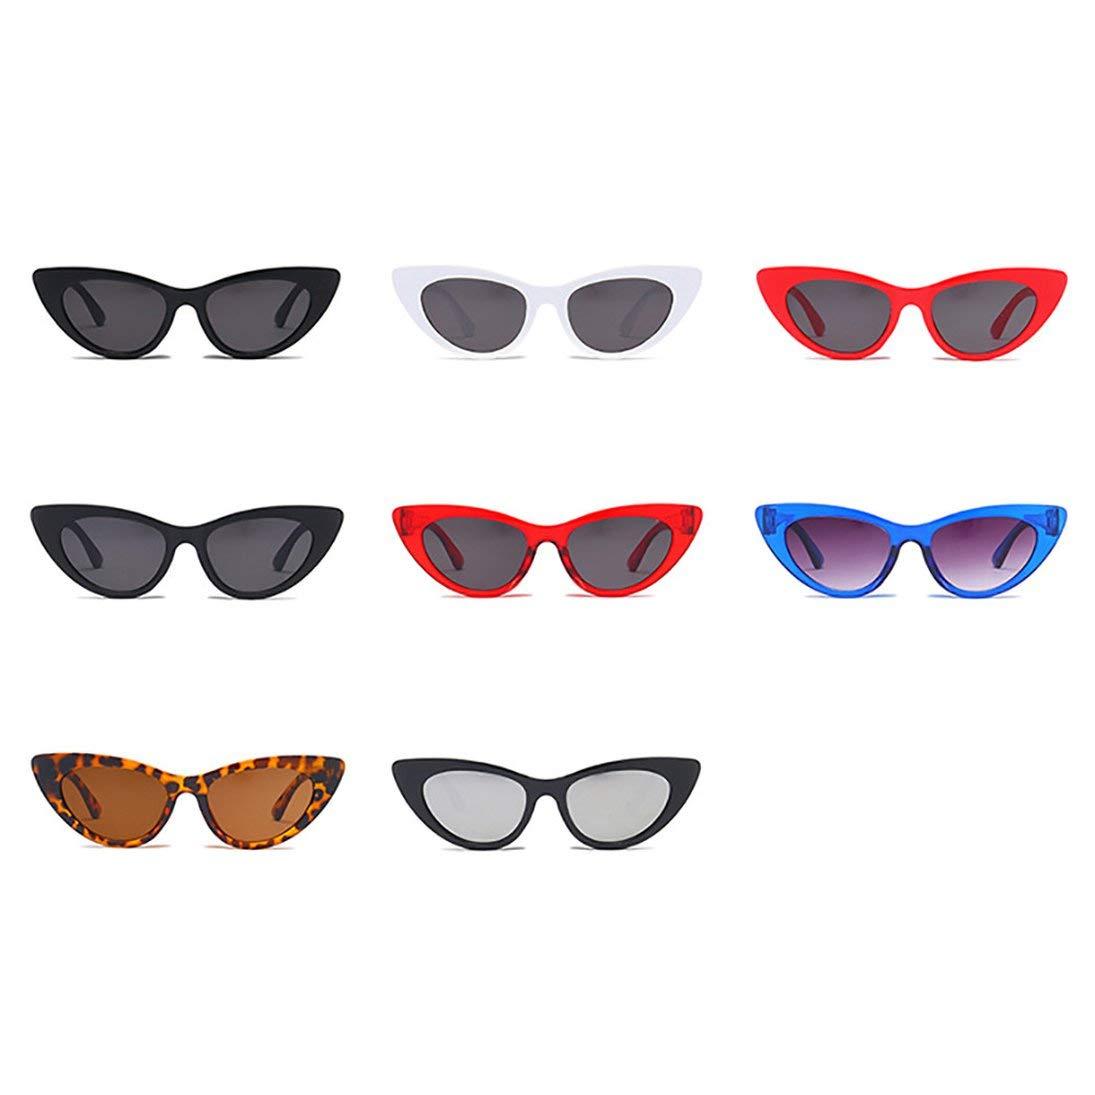 Baynne-CAa2 Lightweight Retro Cateye Sunglasses Mirror UV405 Protection Sun Glasses